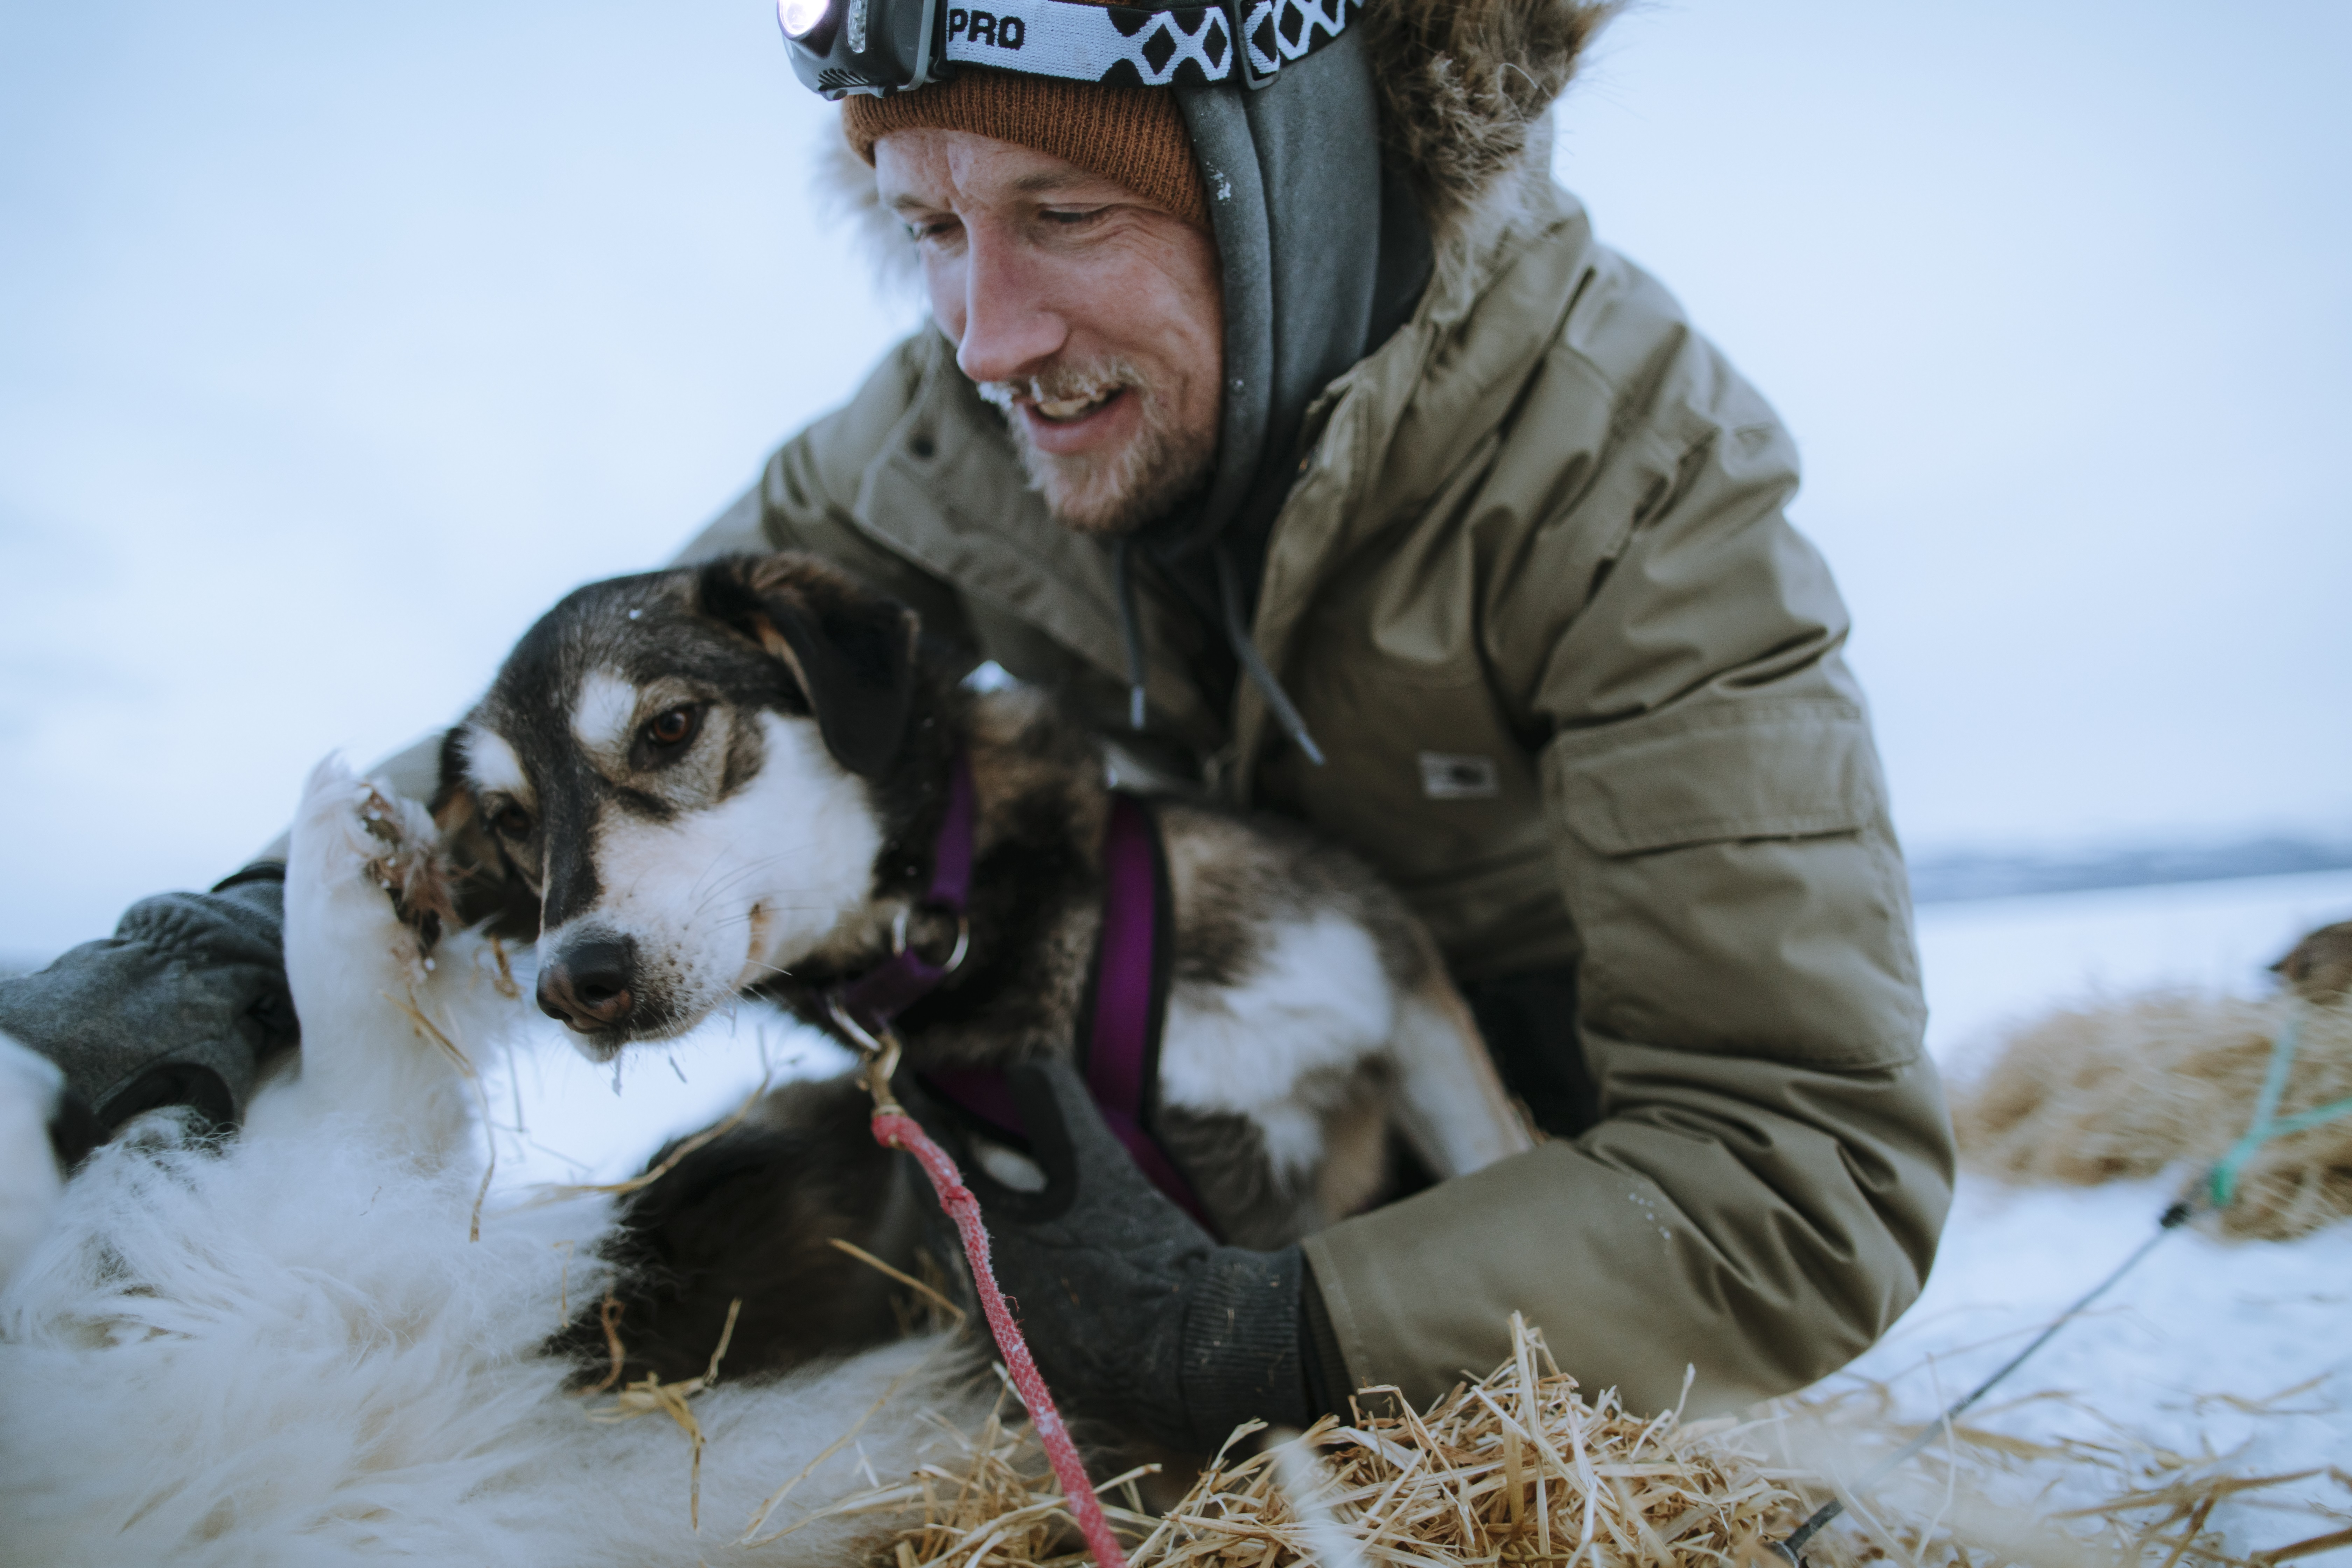 Carhartt Yukon Extremes Lifestyle